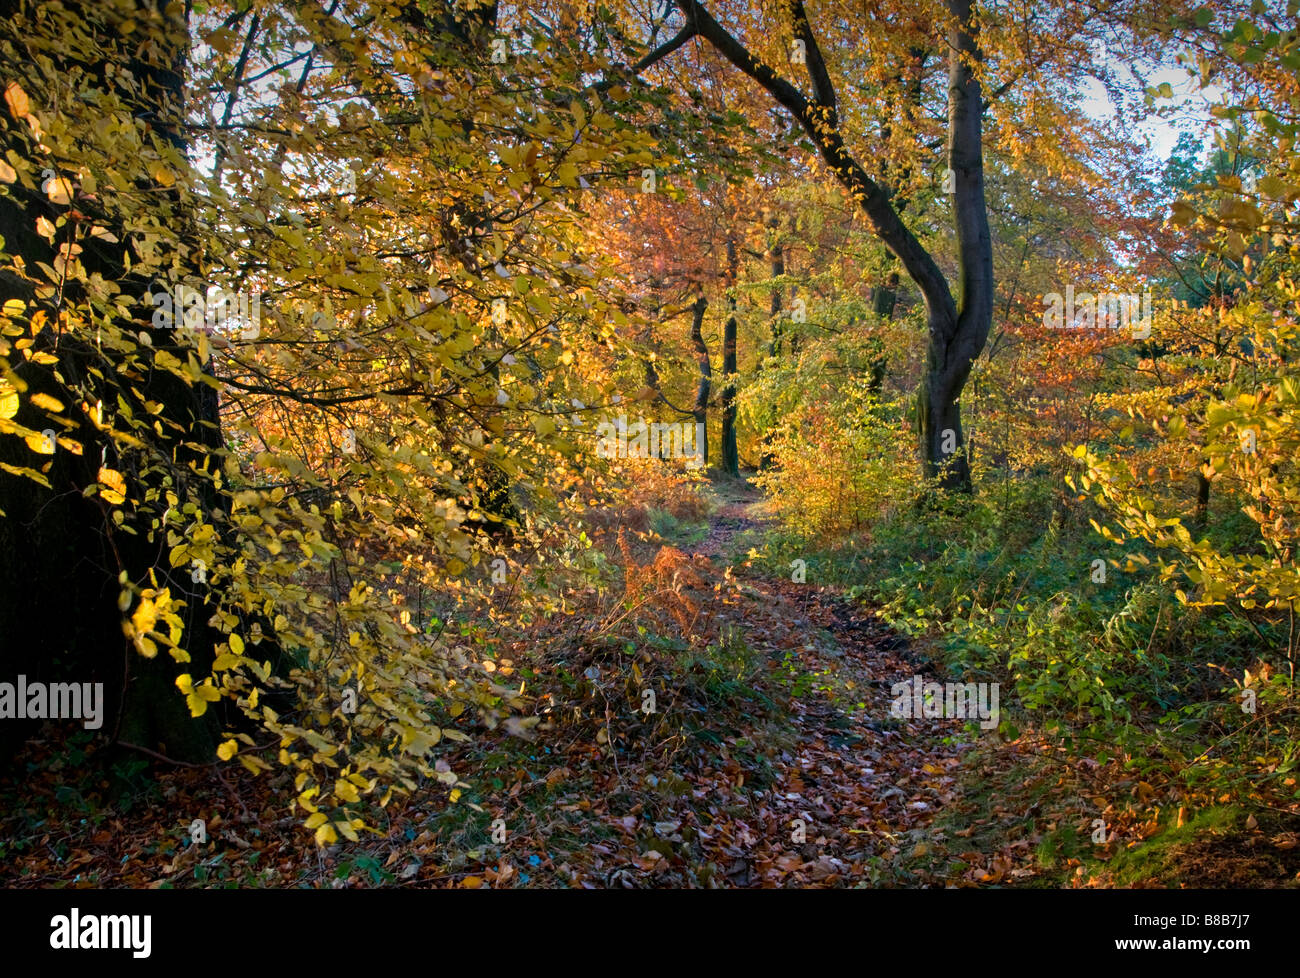 Wooded Track on Artists Lane on 'The Edge' in Autumn, Alderley Edge, Cheshire, England, UK - Stock Image